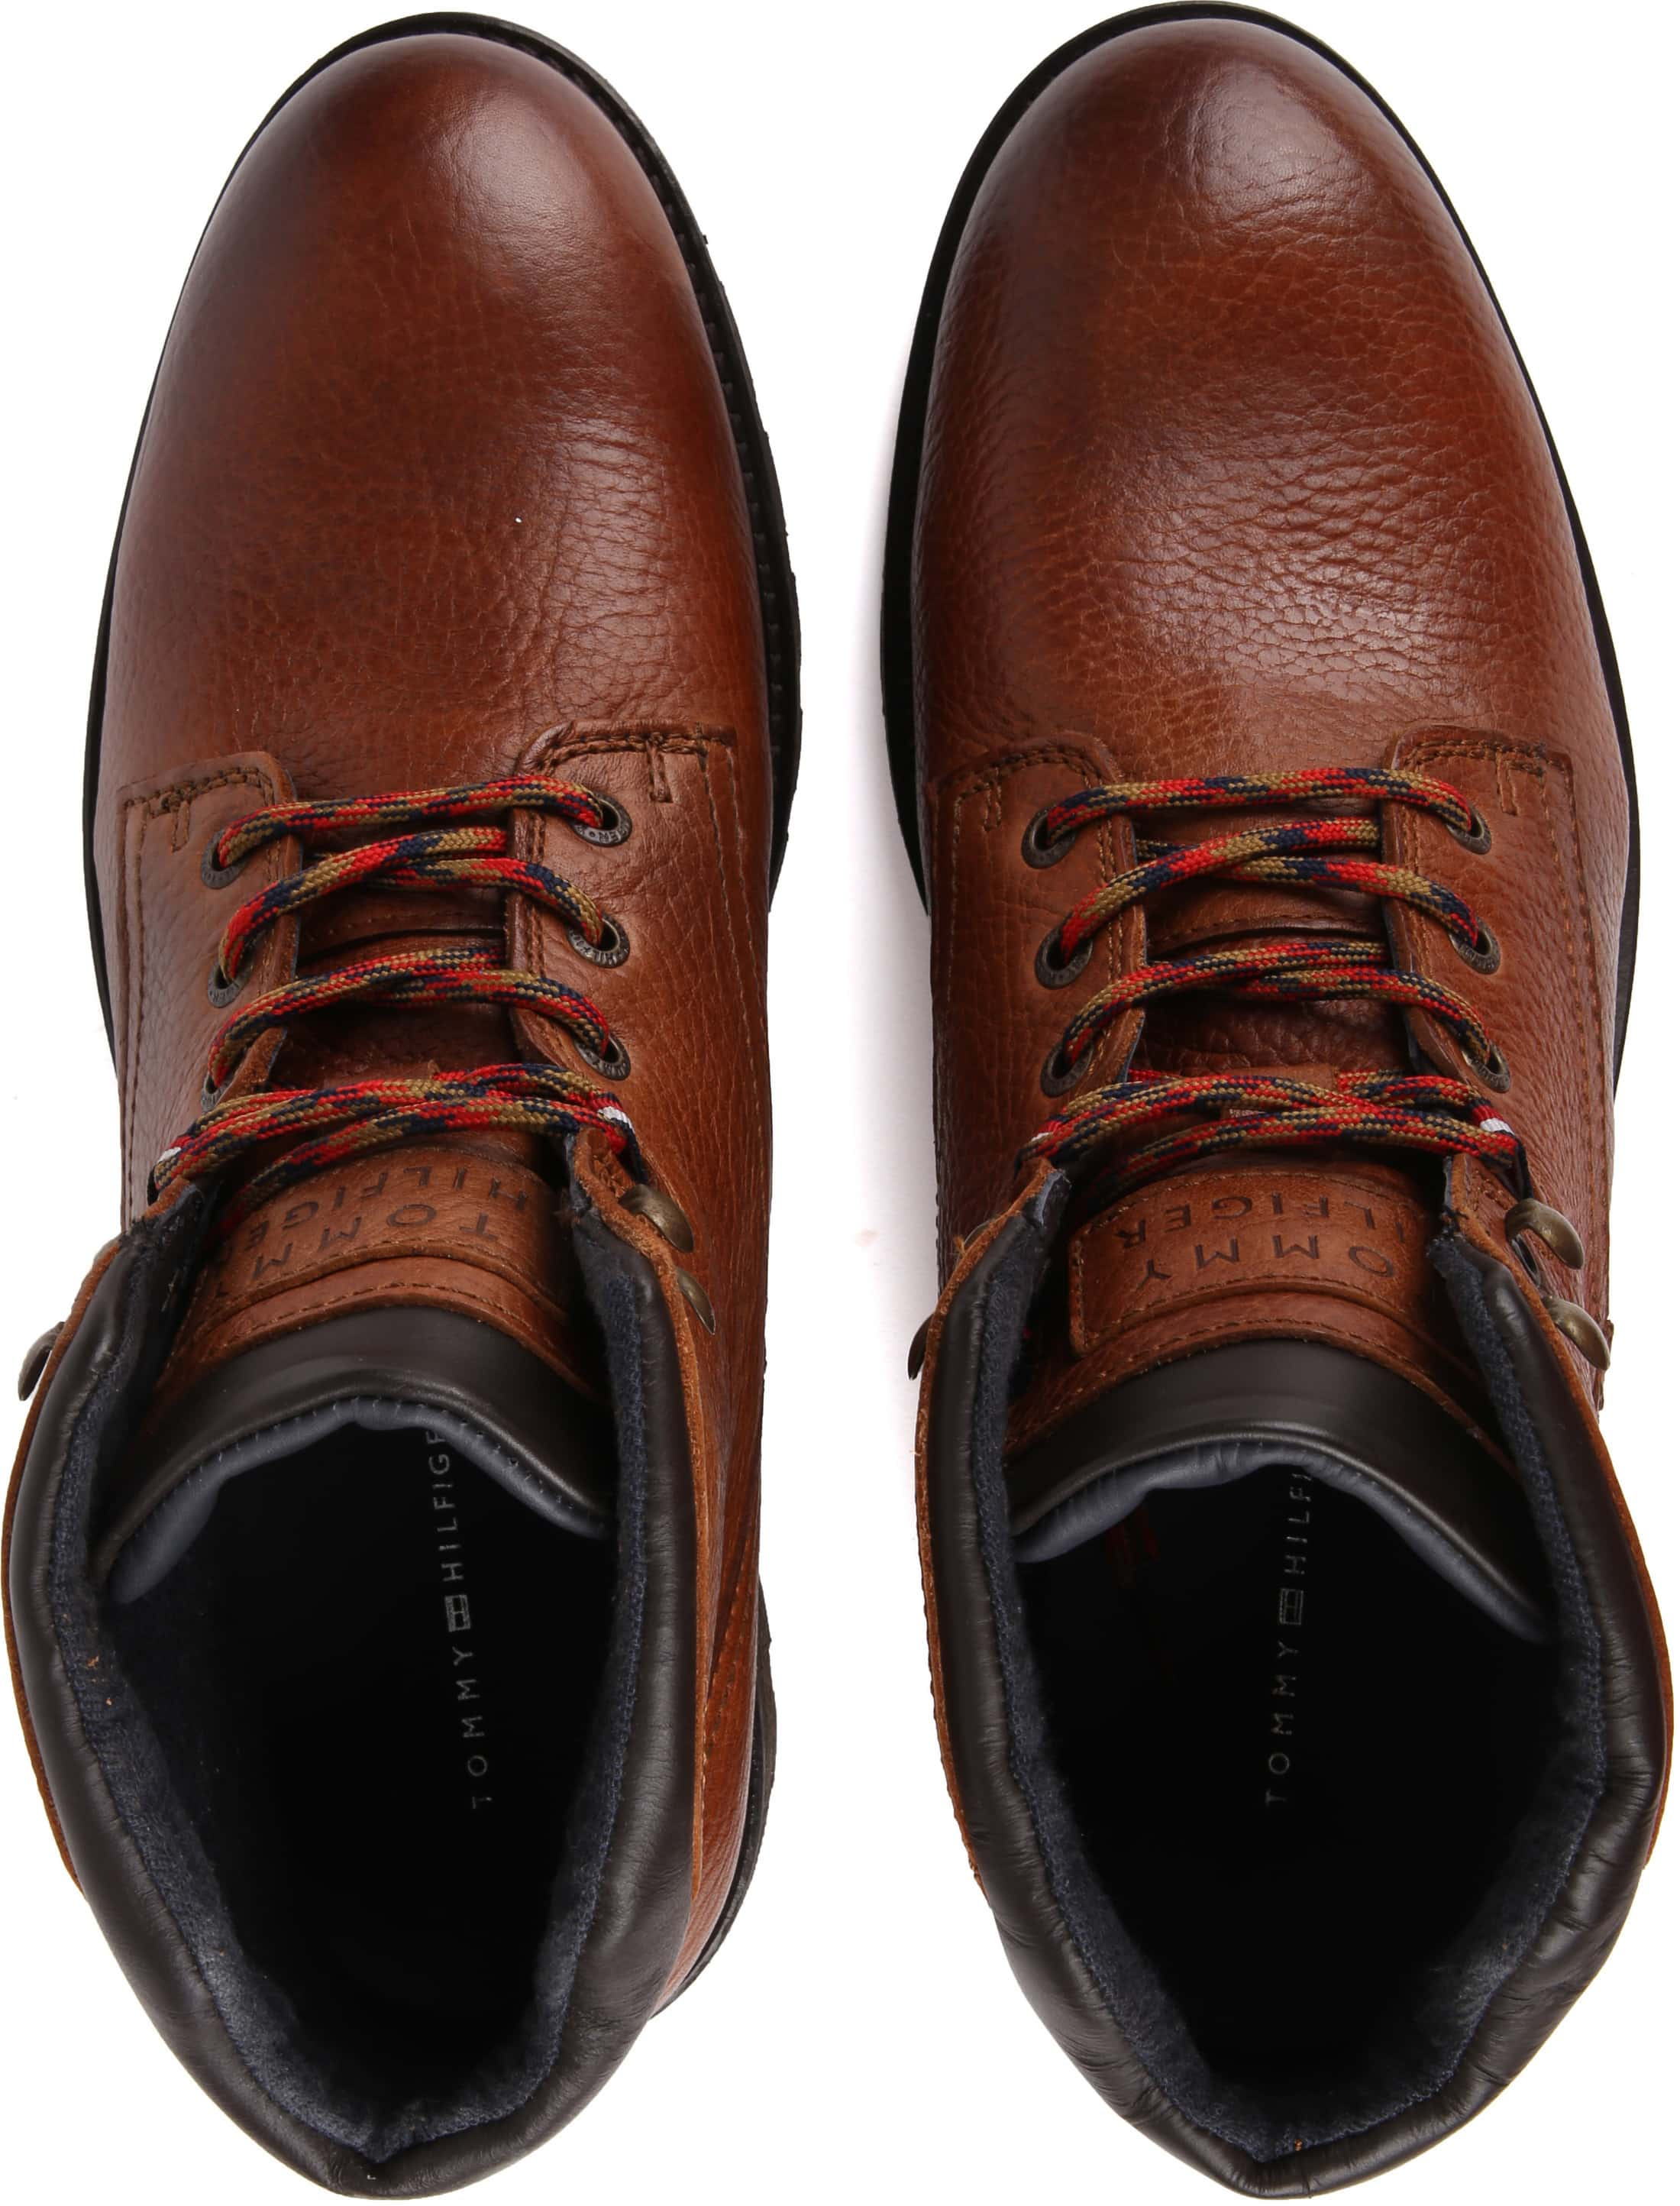 Tommy Hilfiger Boots Cognac foto 4